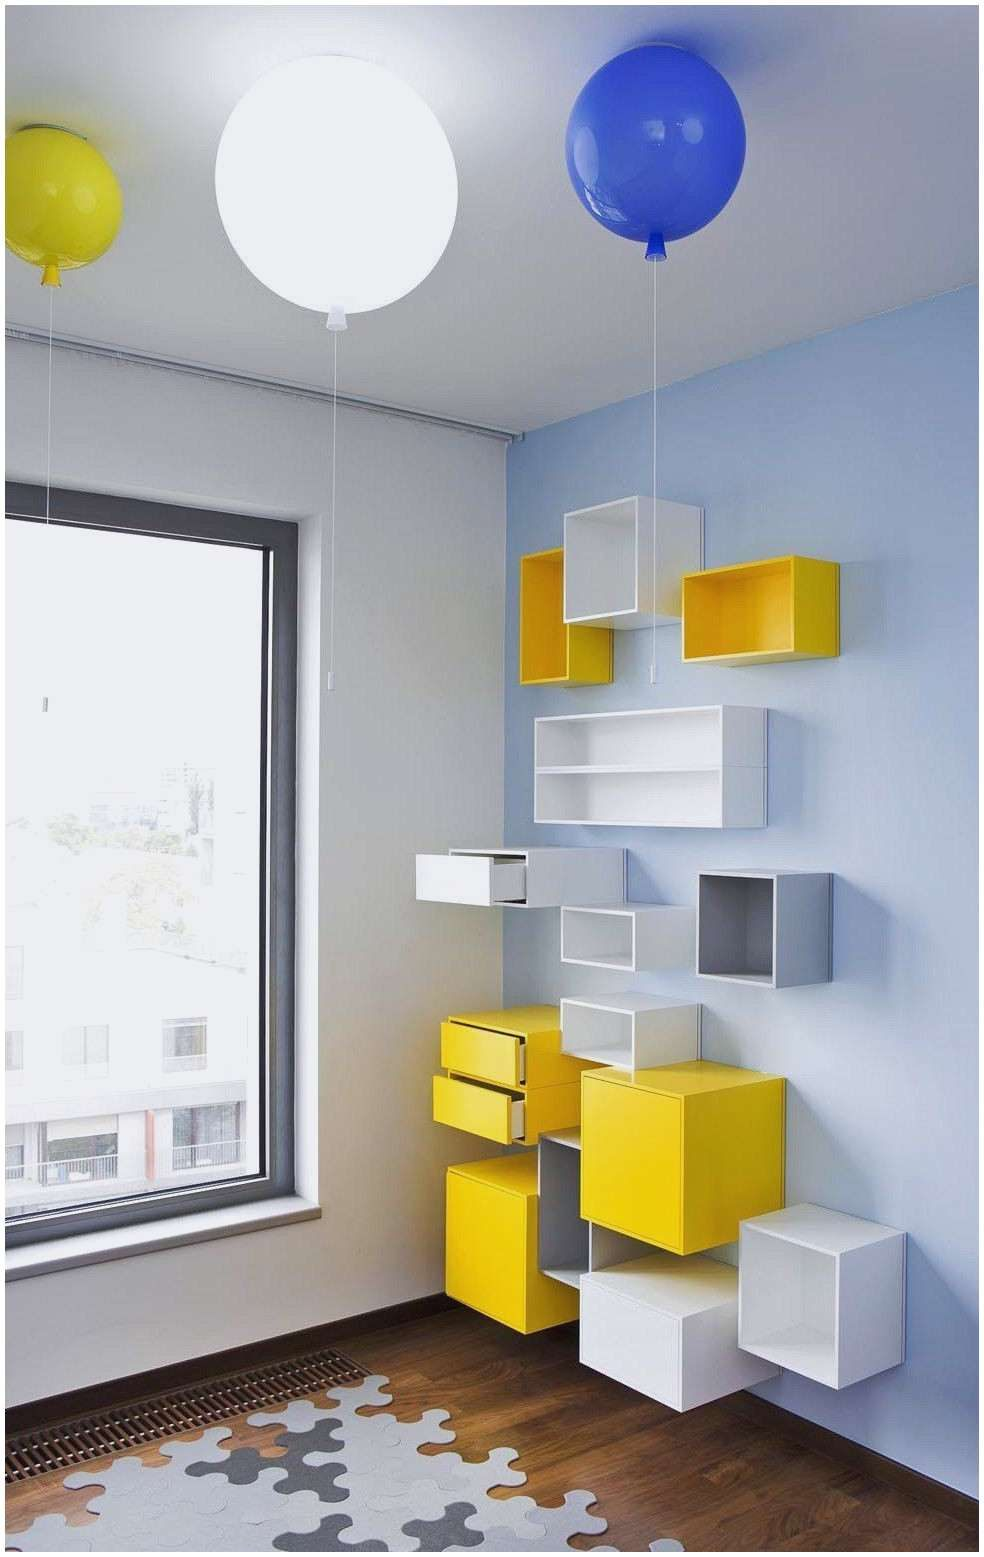 Lit Mezzanine Studio De Luxe 57 Mezzanine Ado Concept Jongor4hire